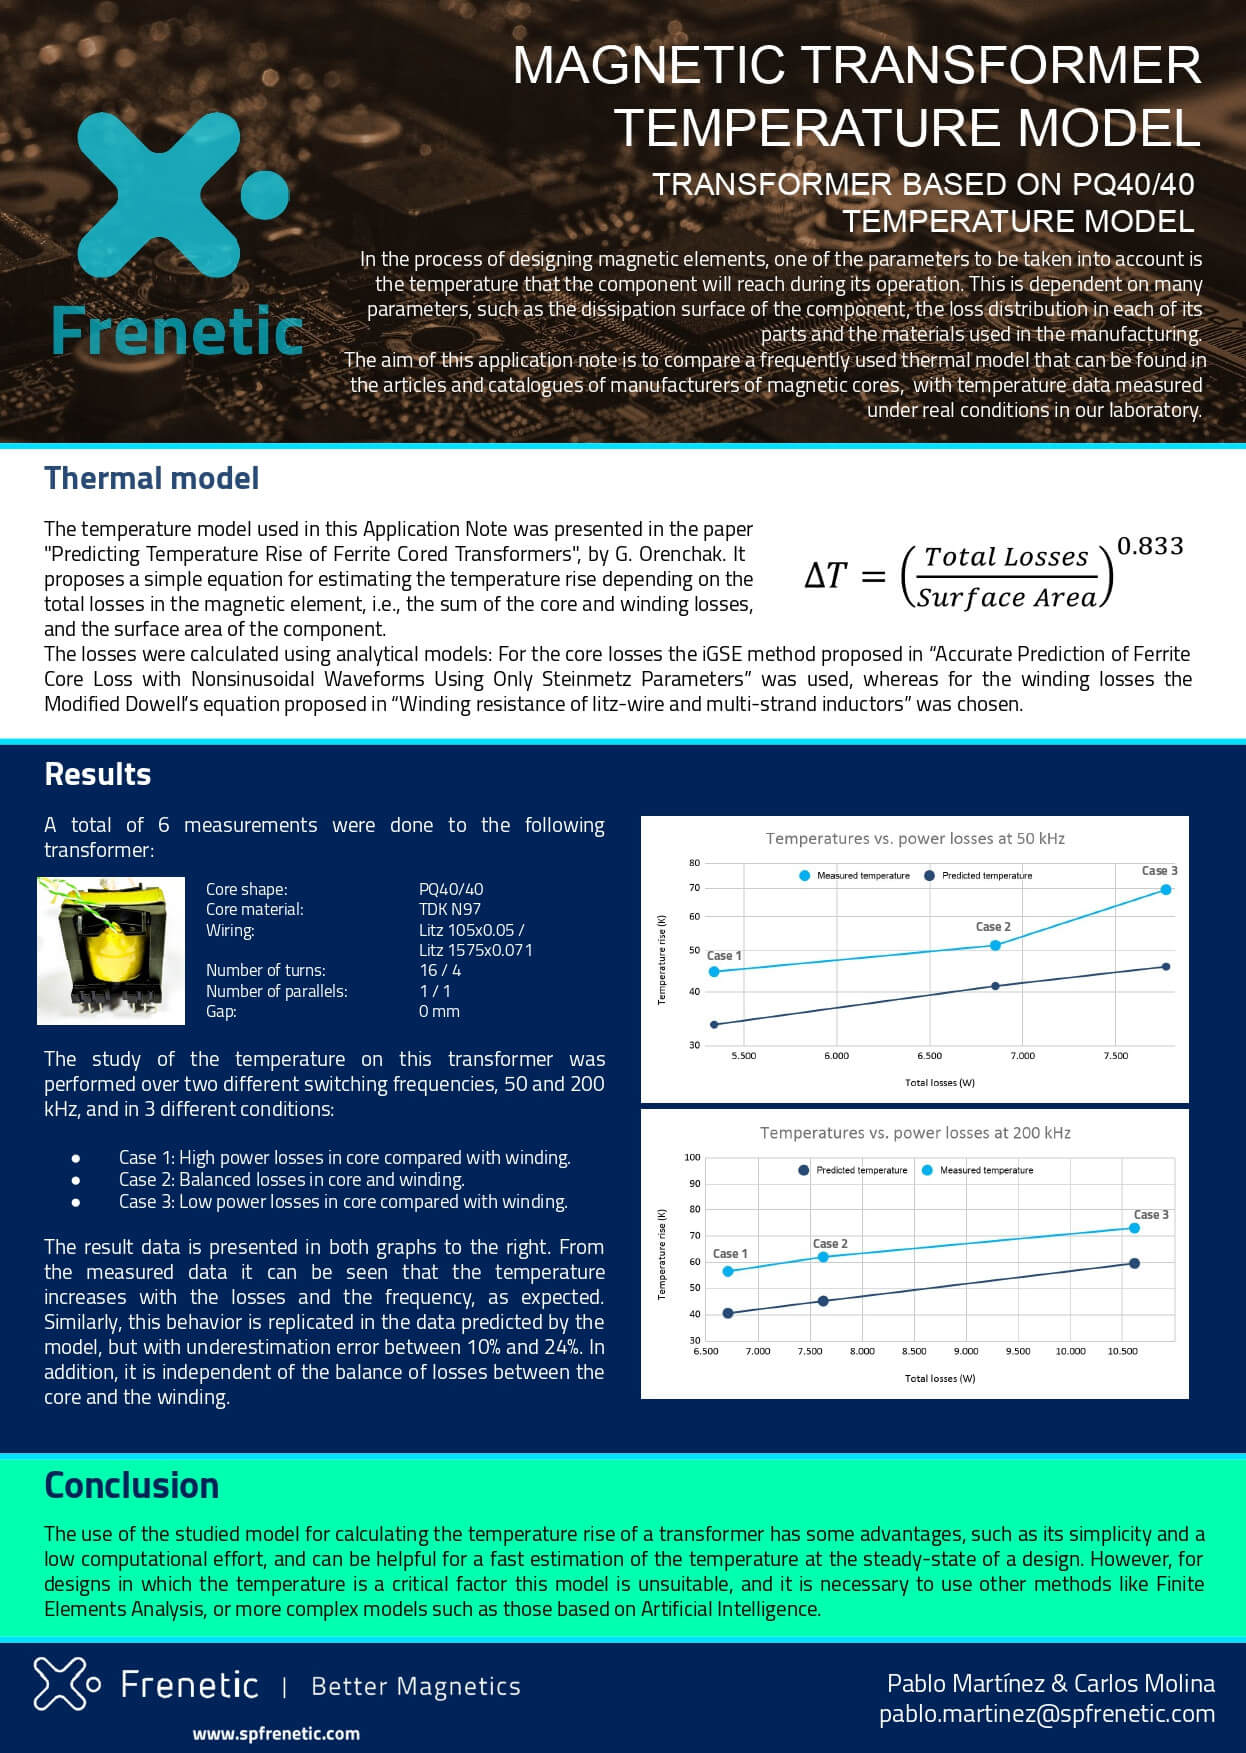 MAGNETIC TRANSFORMER TEMPERATURE MODEL: Transformer based on PQ40/40 temperature model